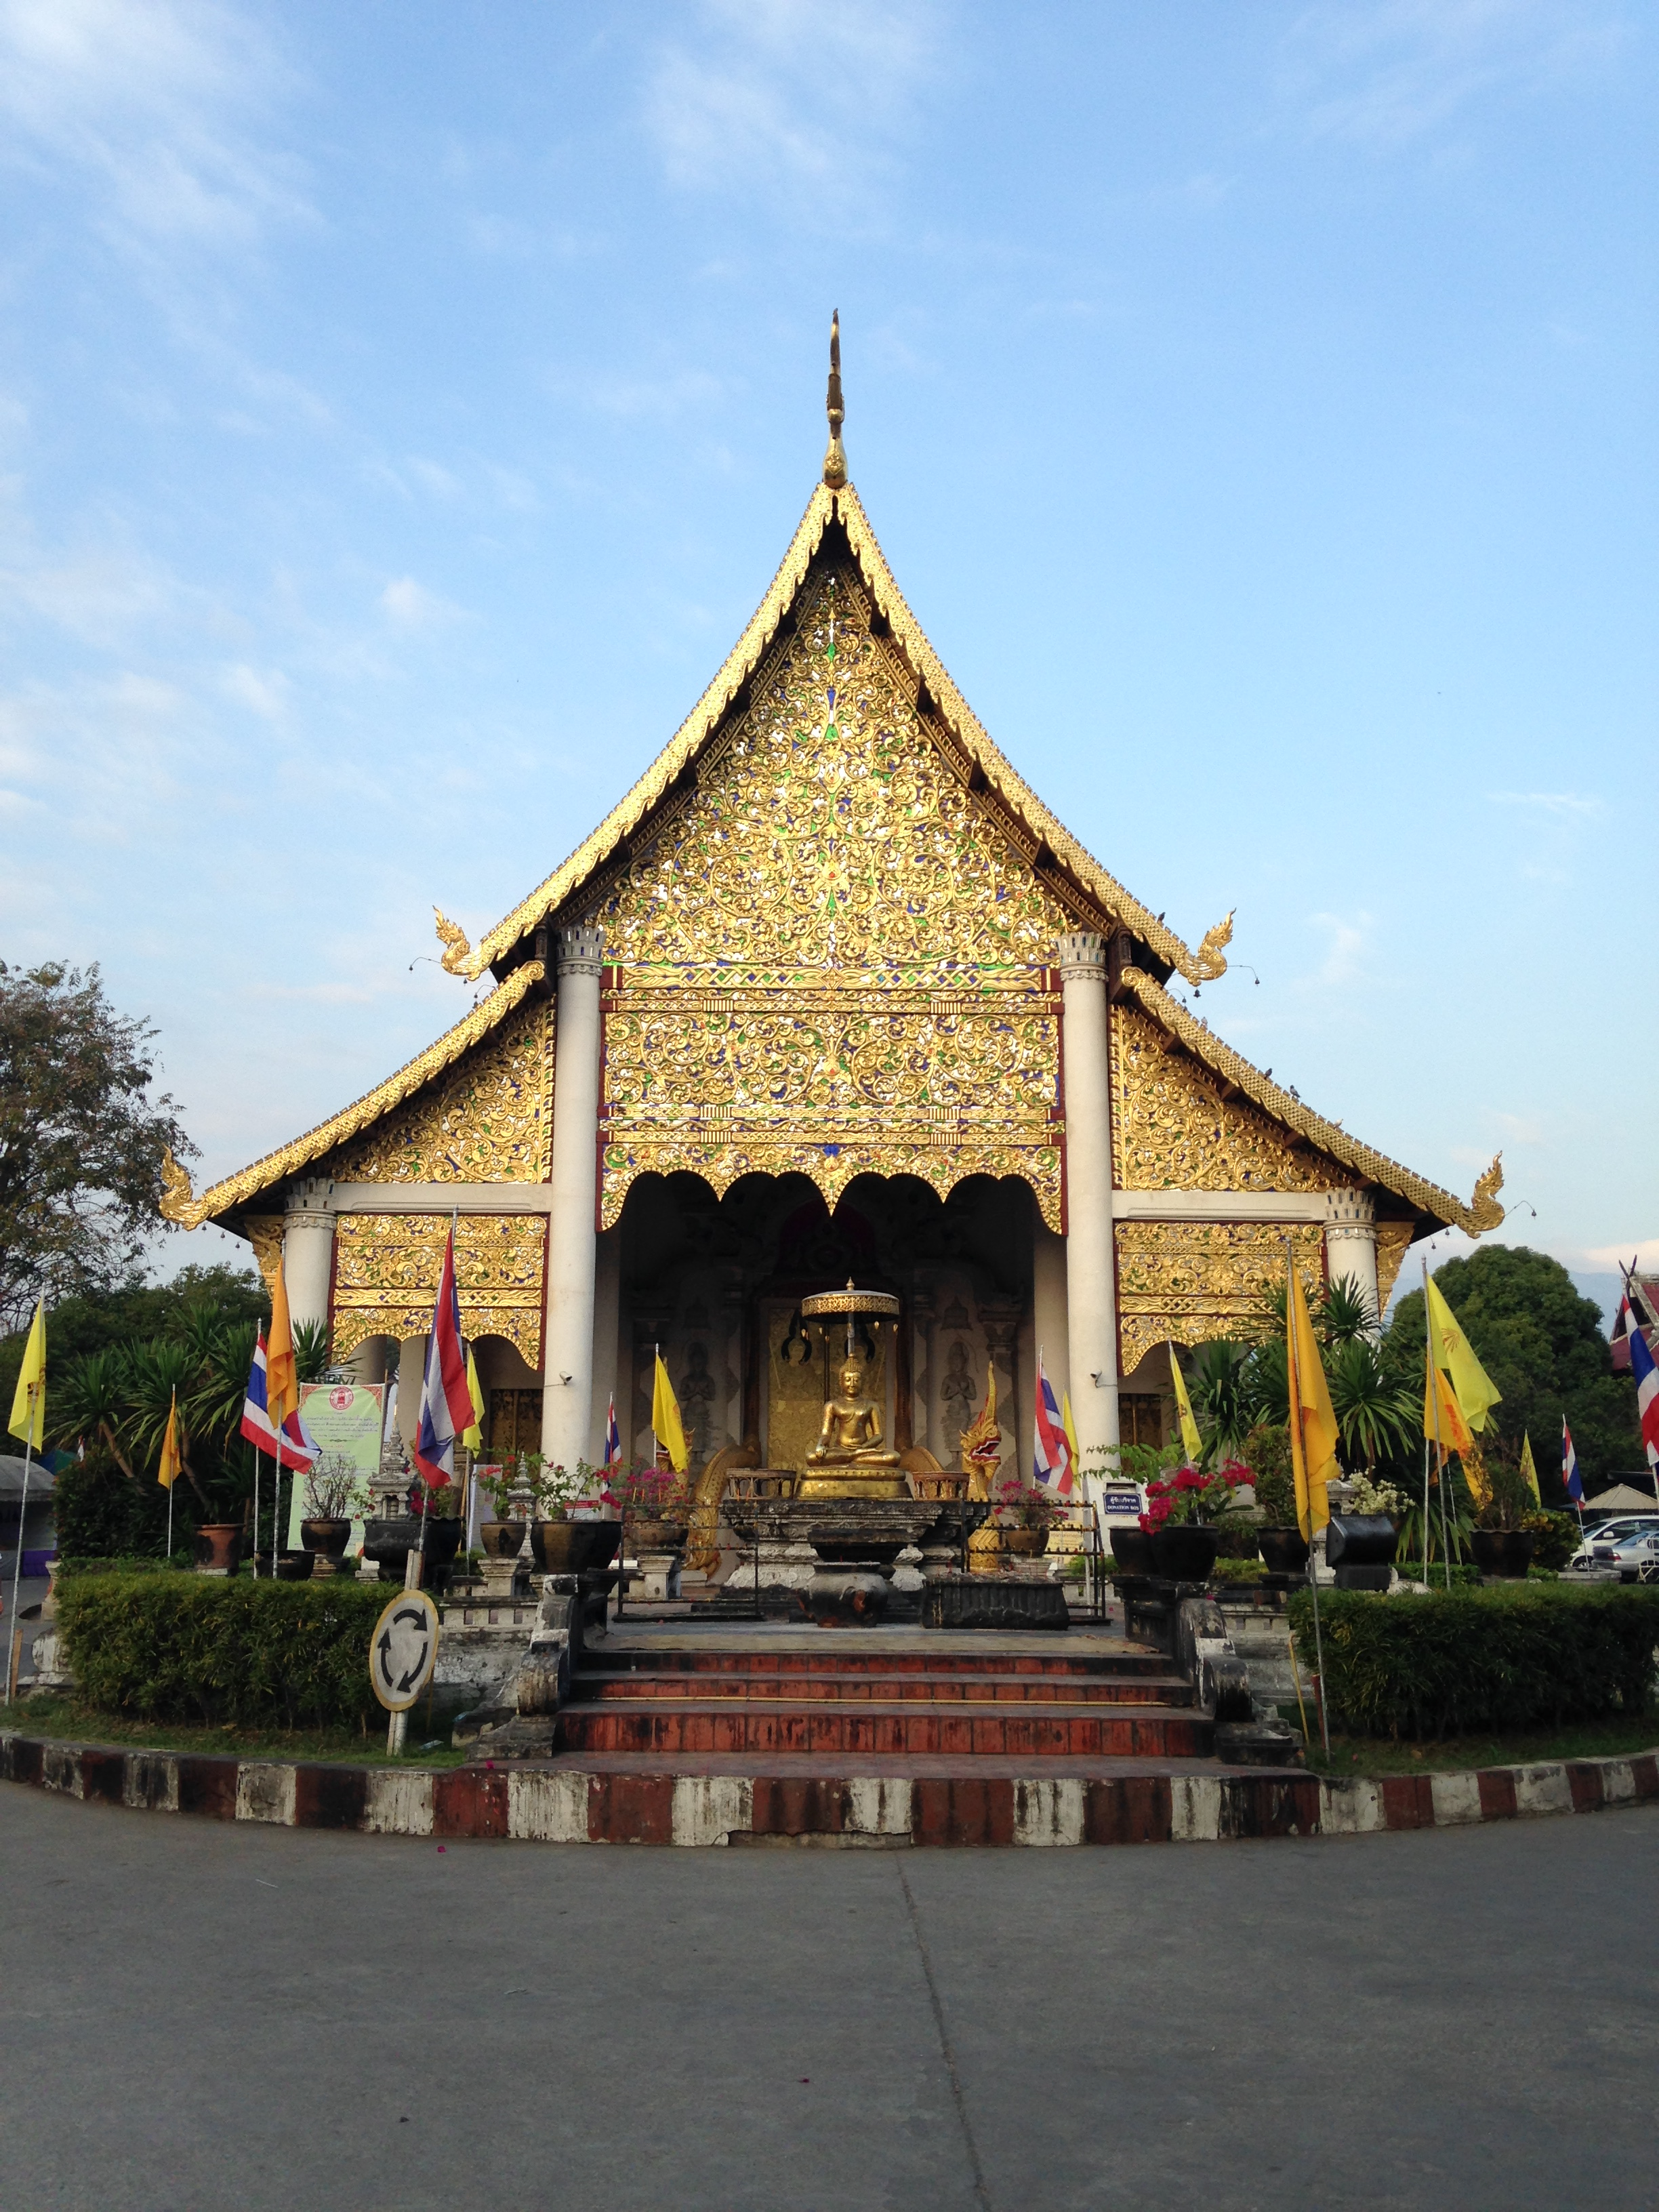 across the street from Lamphu House is Wat Phan Tao